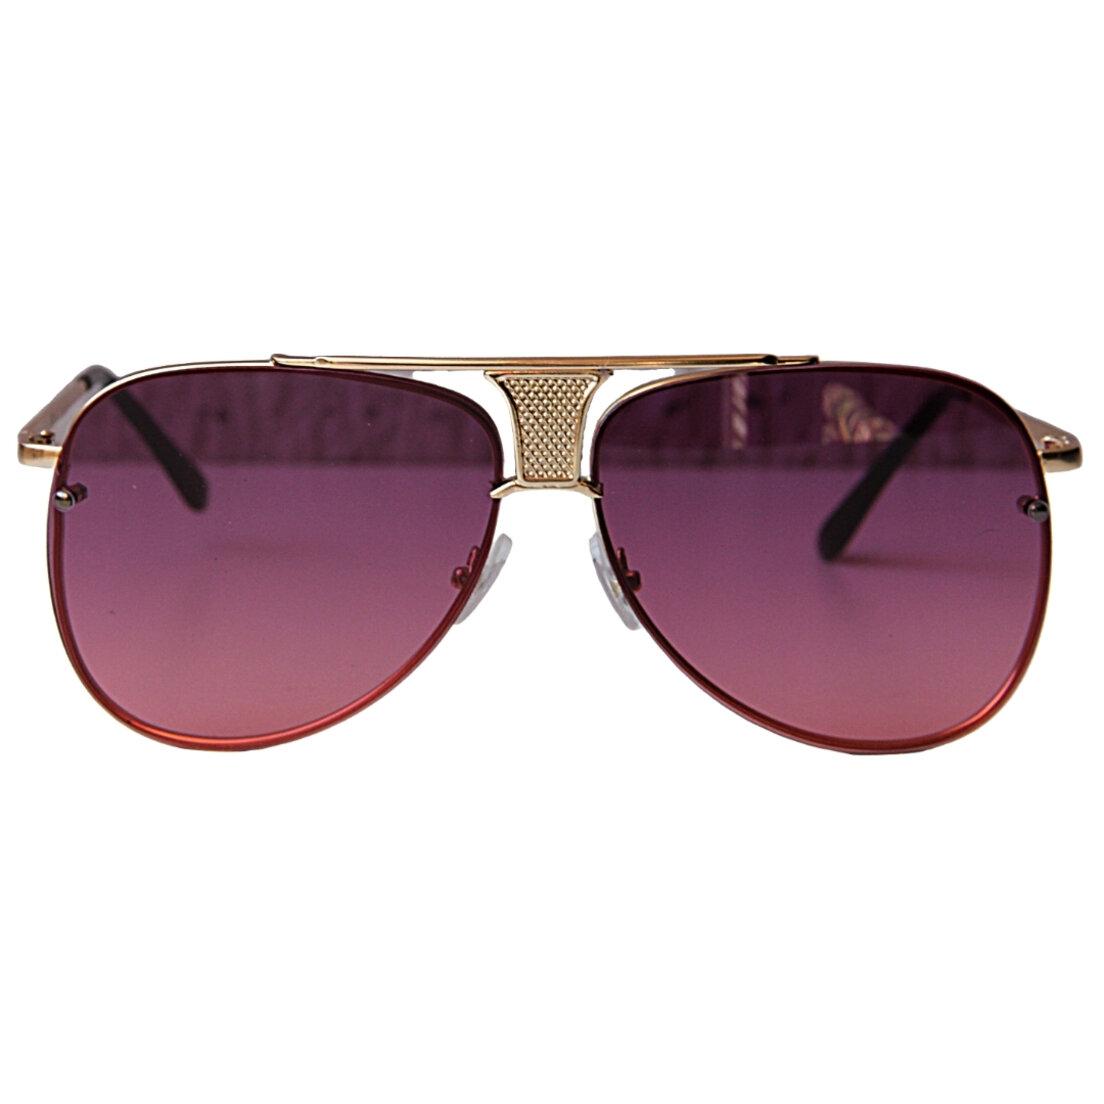 OUTLET - Óculos de Sol Khatto Aviador Retrô - Roxo